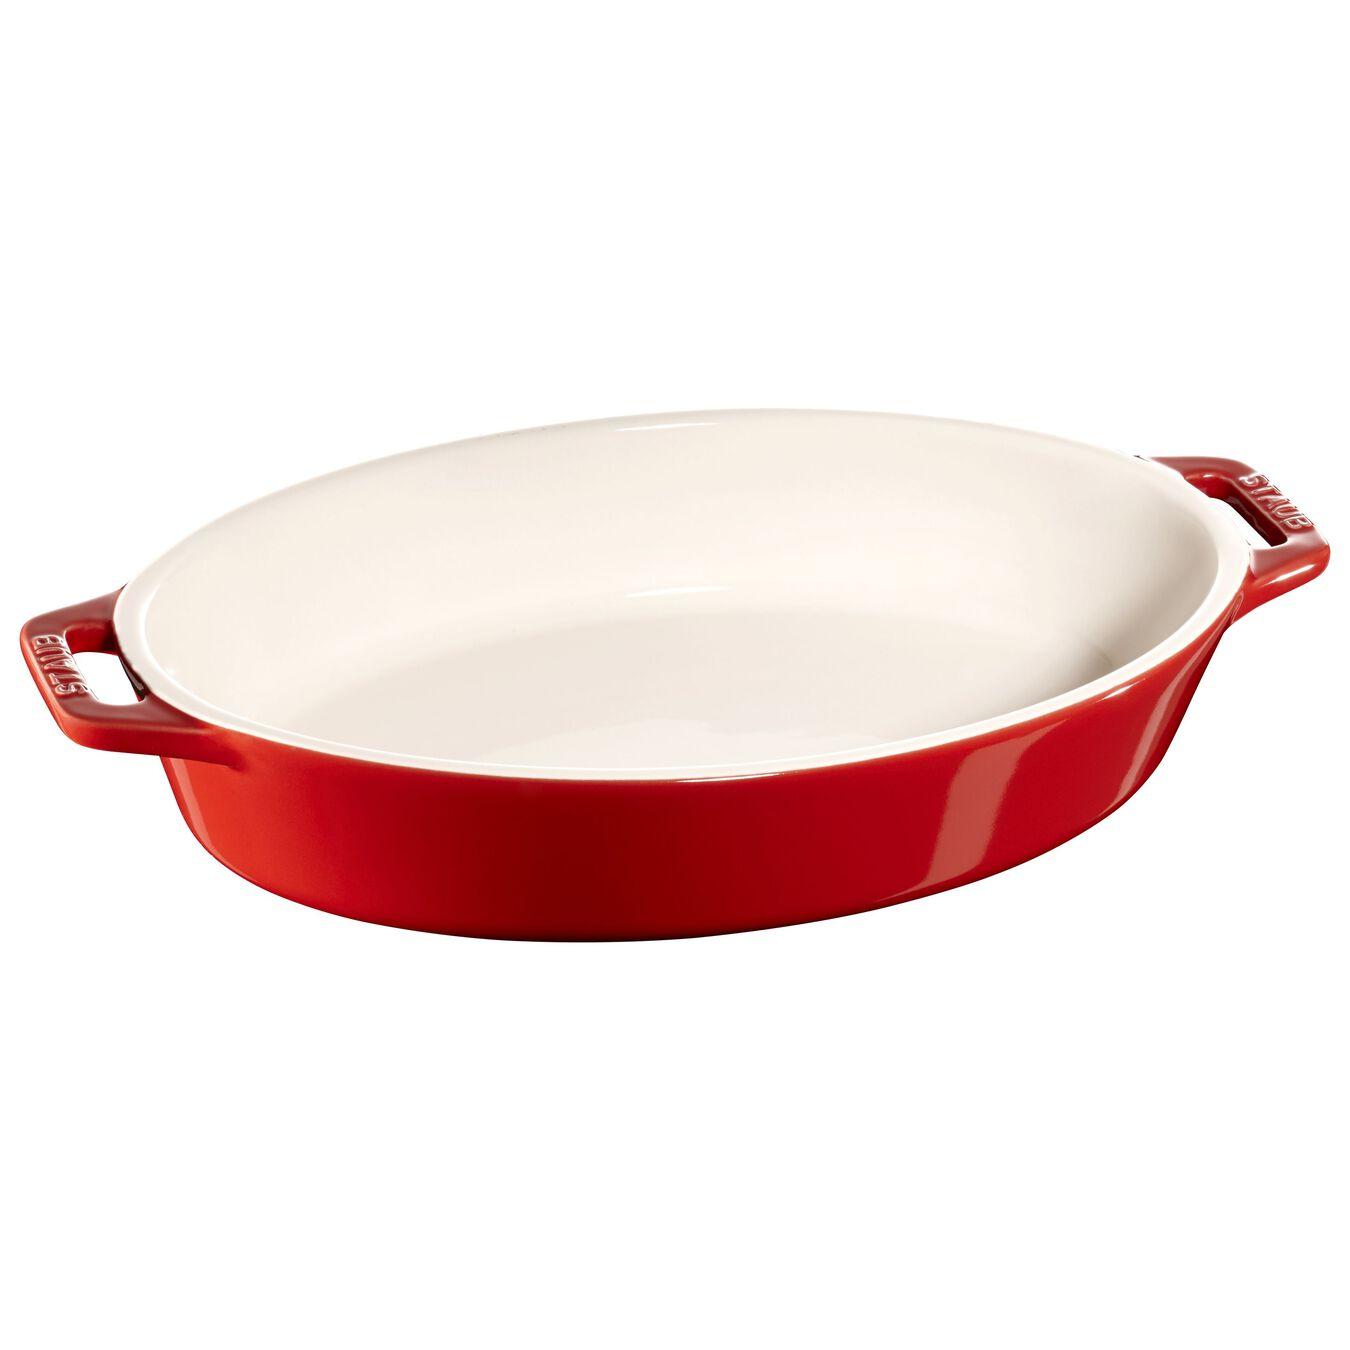 9-inch Ceramic Oven dish,,large 1